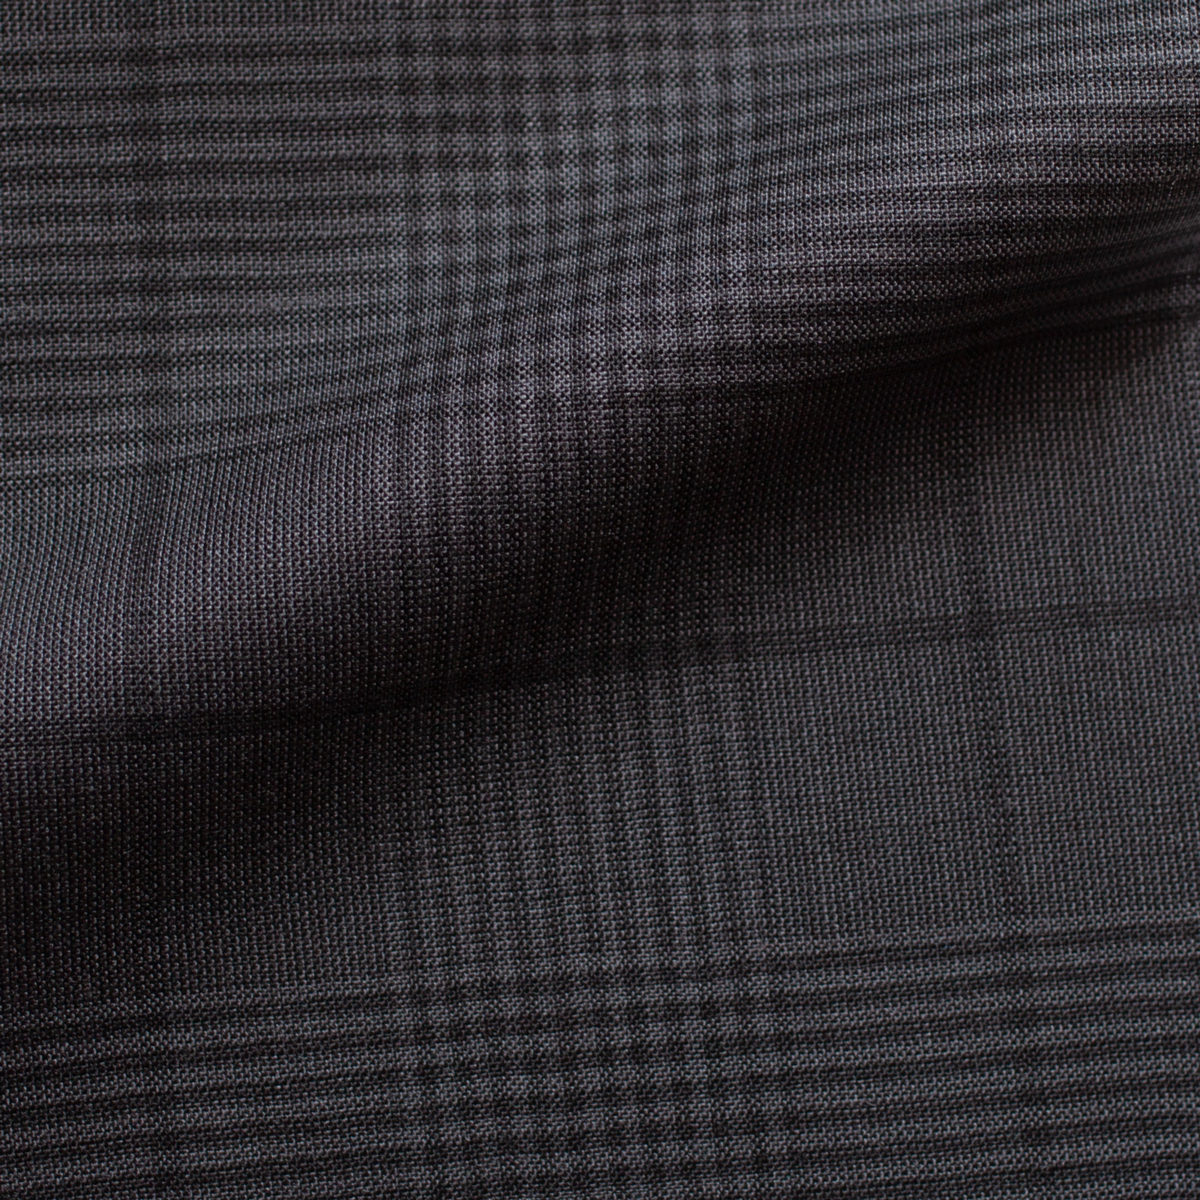 5bc003-texture